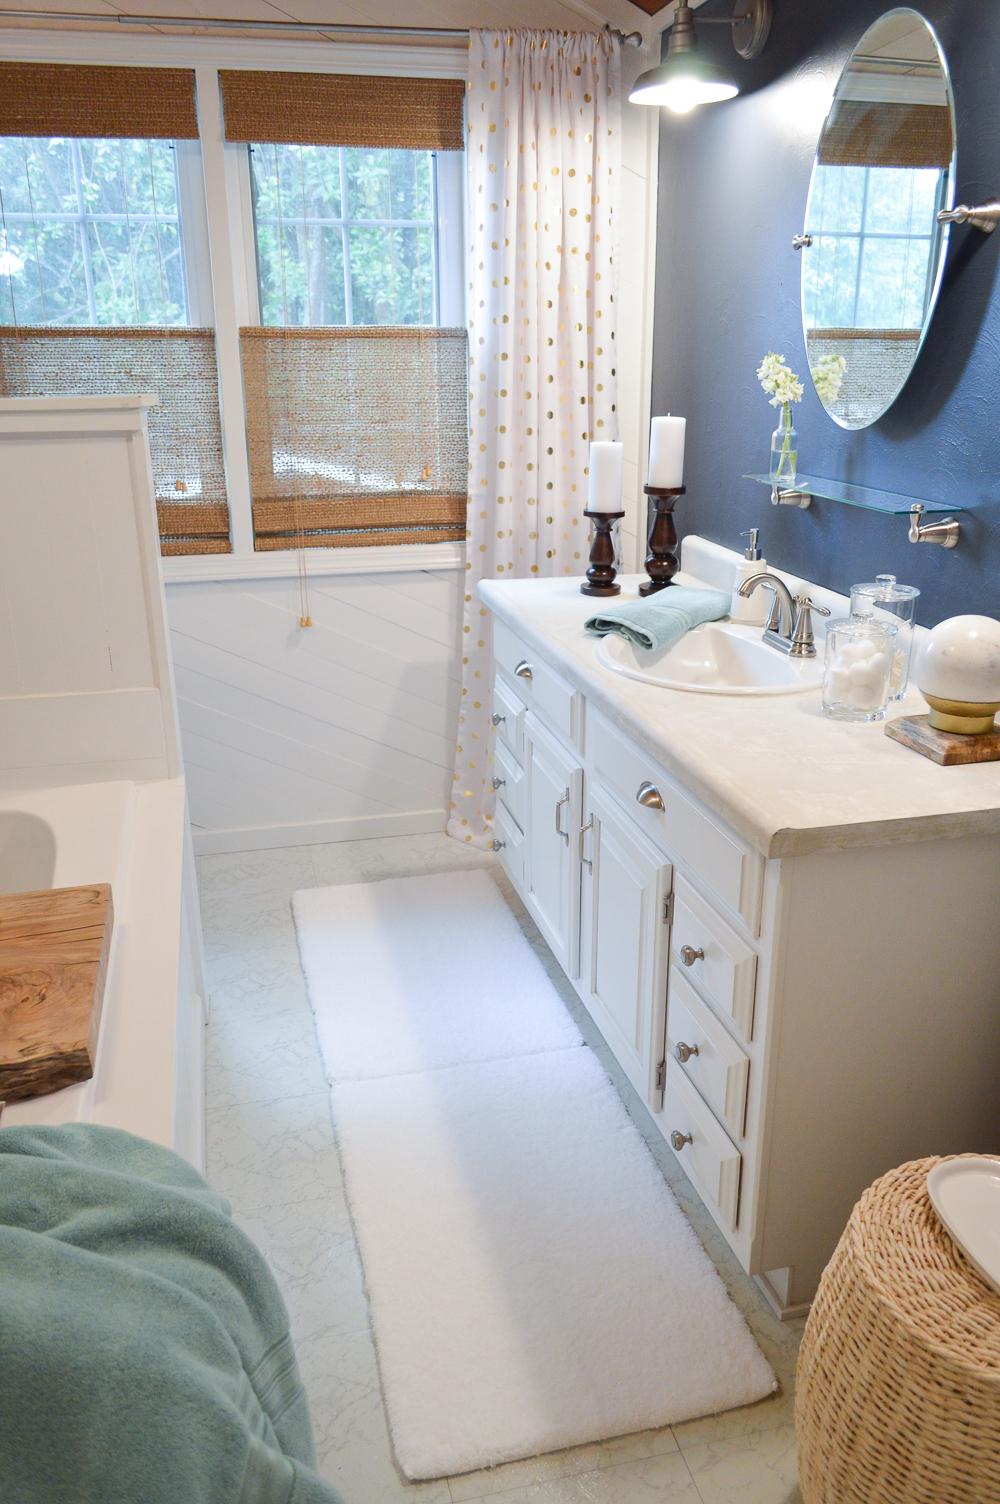 Mini Makeover Summer Bathroom Refresh - aqua, navy, white & warm wood.